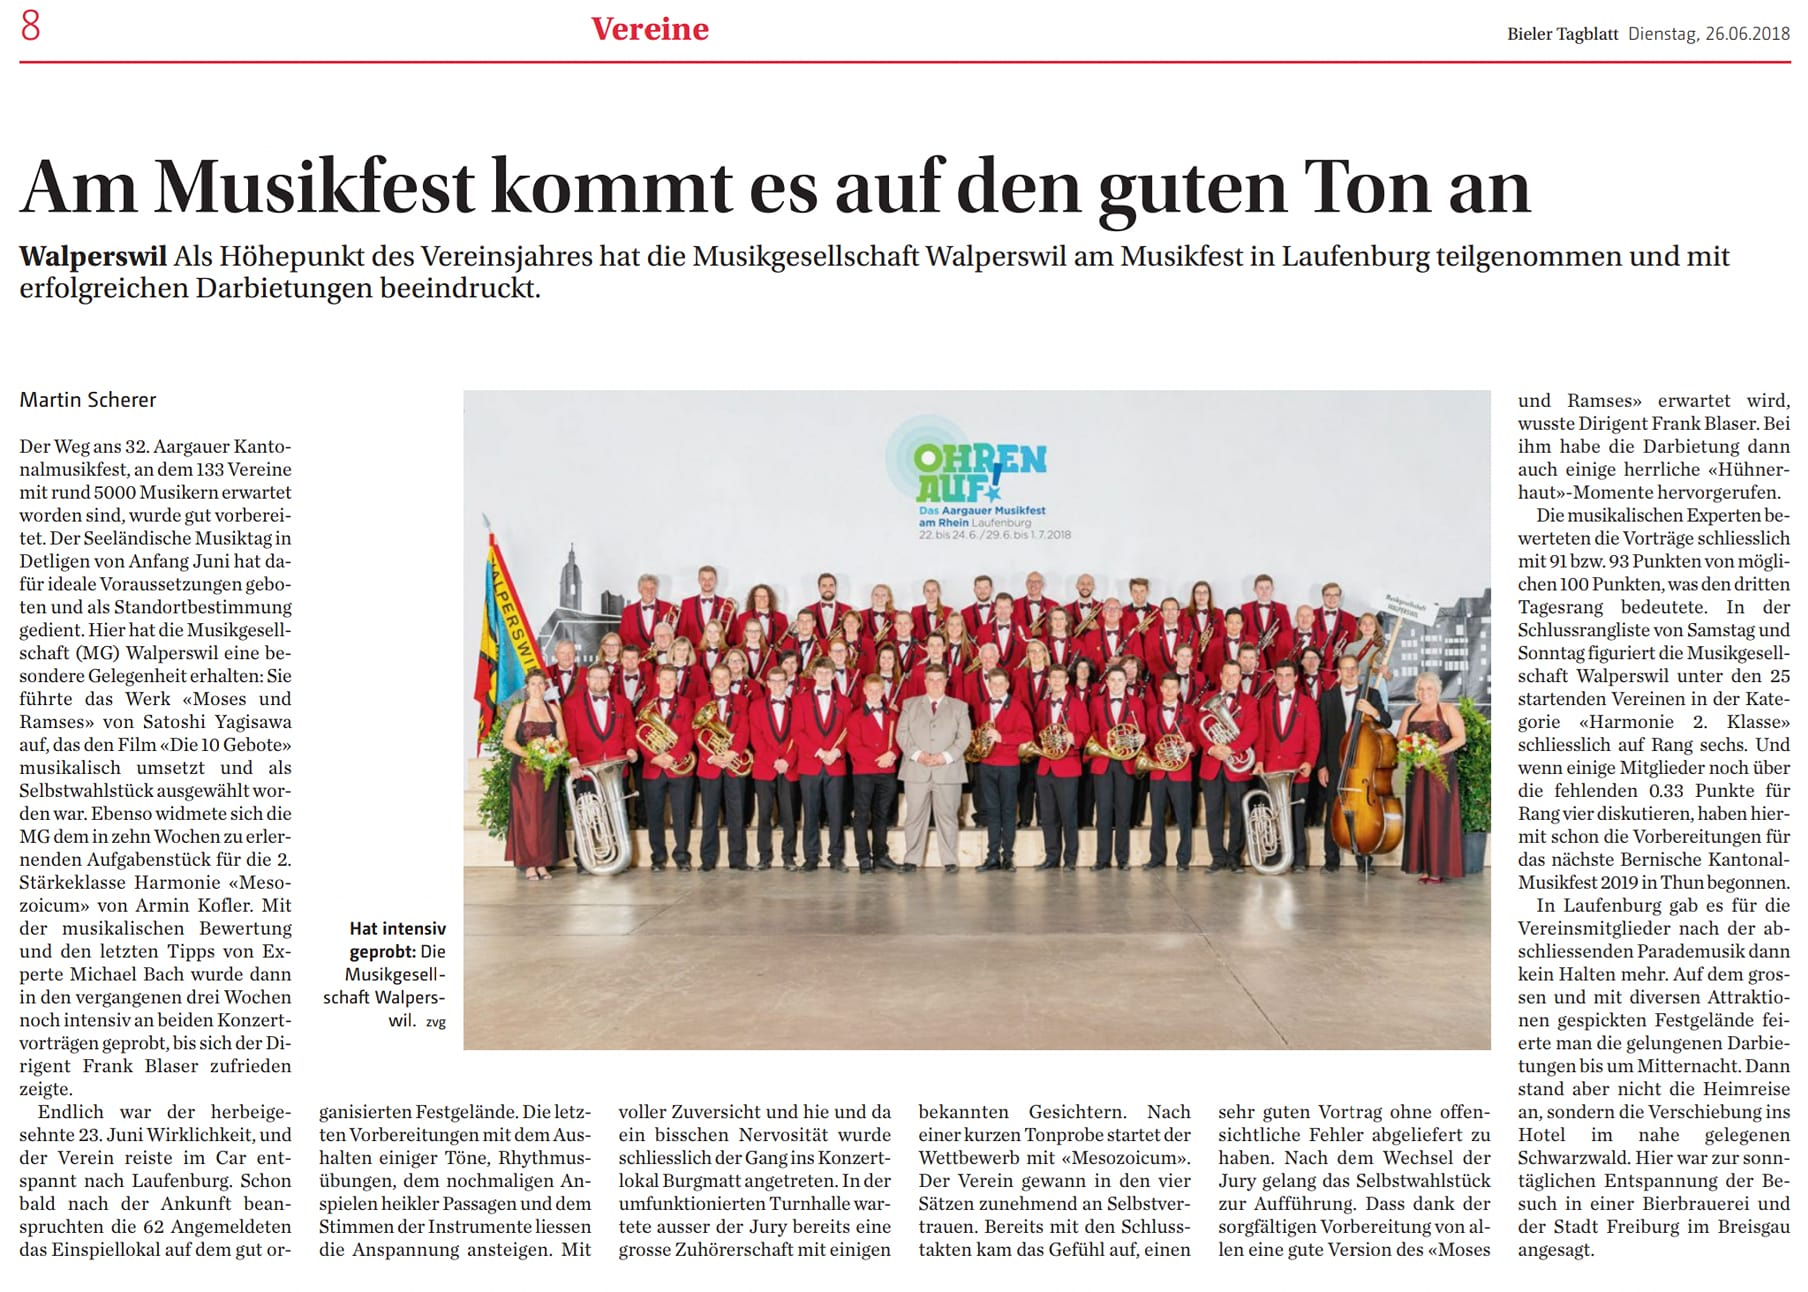 Beitrag im Bieler Tagblatt vom 26.06.2018